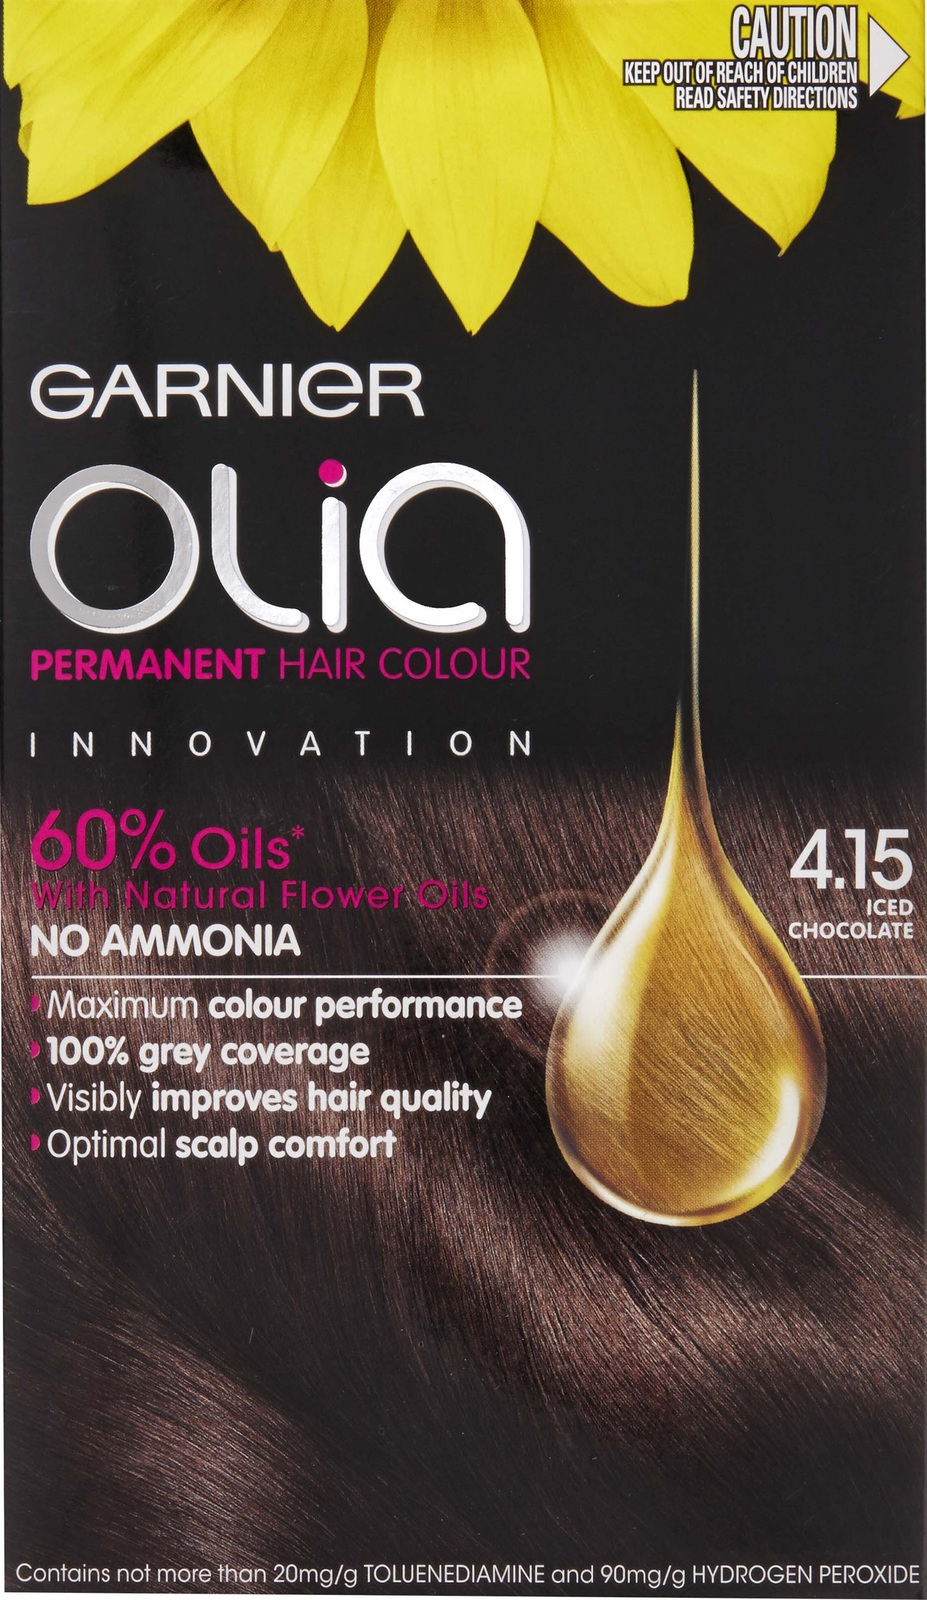 Garnier olia permanent hair colour golden brown 5 3 - Garnier Olia Permanent Hair Colour 4 15 Iced Chocolate Image